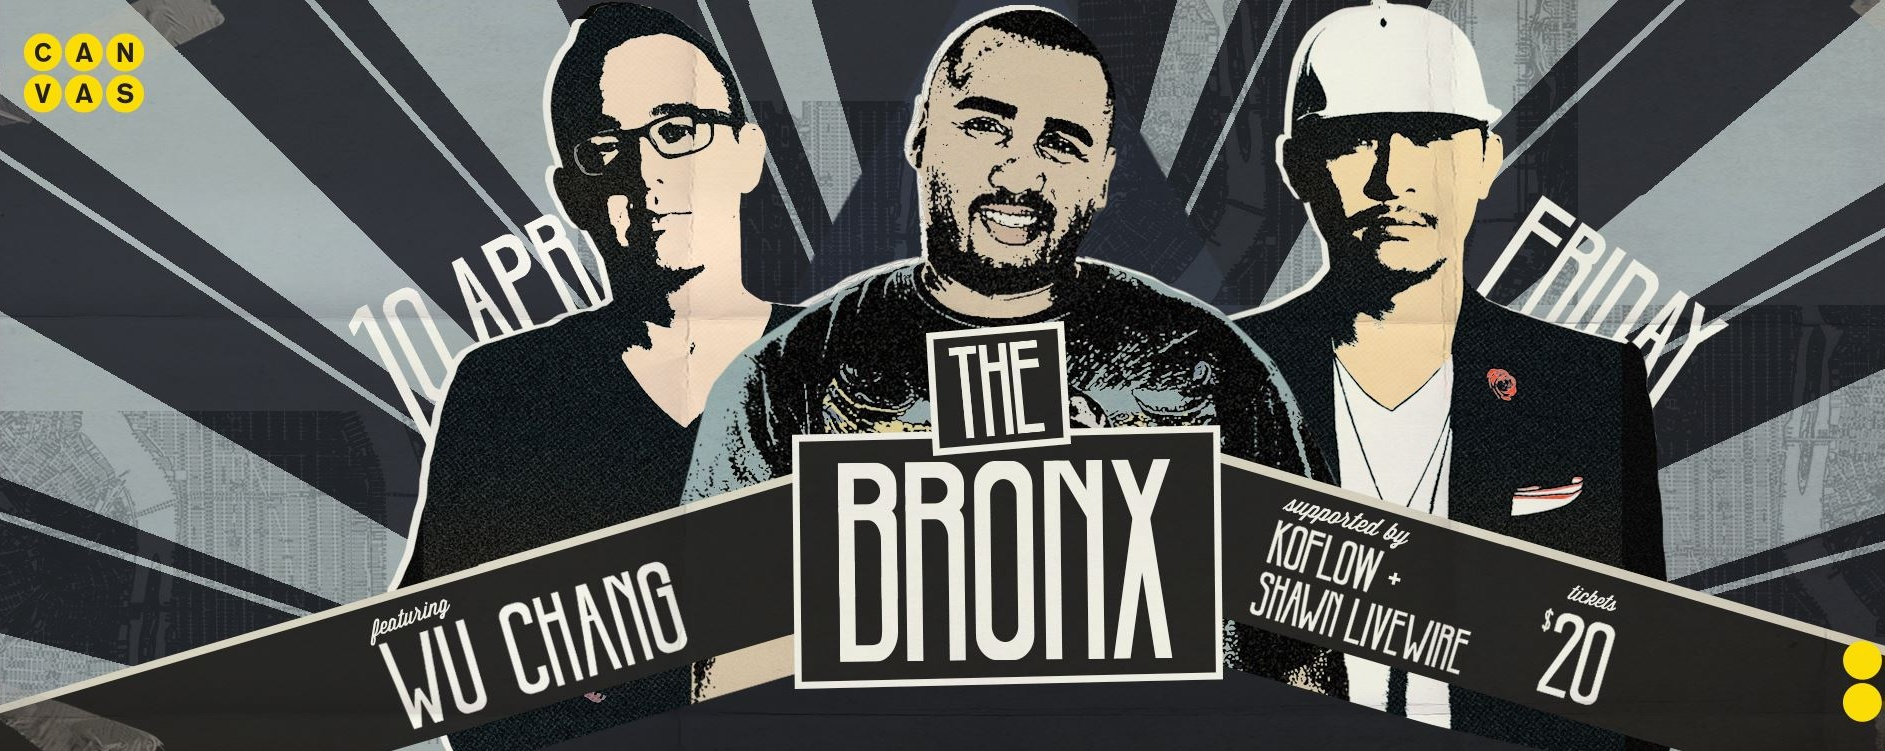 The Bronx ft. Wu Chang (US)